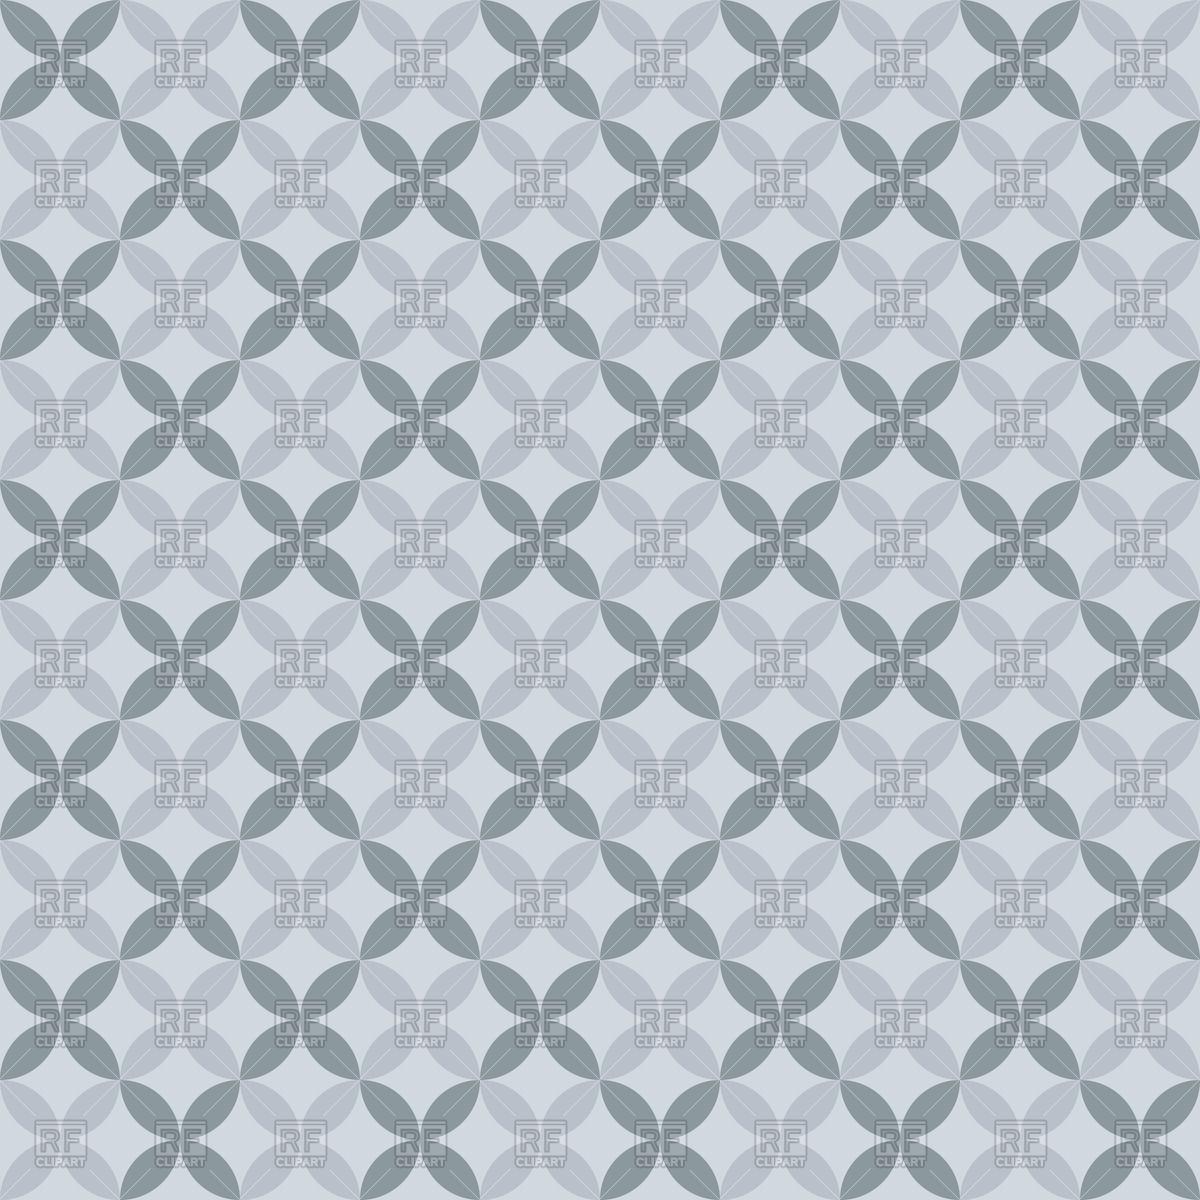 1200x1200 Grey Elegant Seamless Floral Pattern Vector Image Vector Artwork